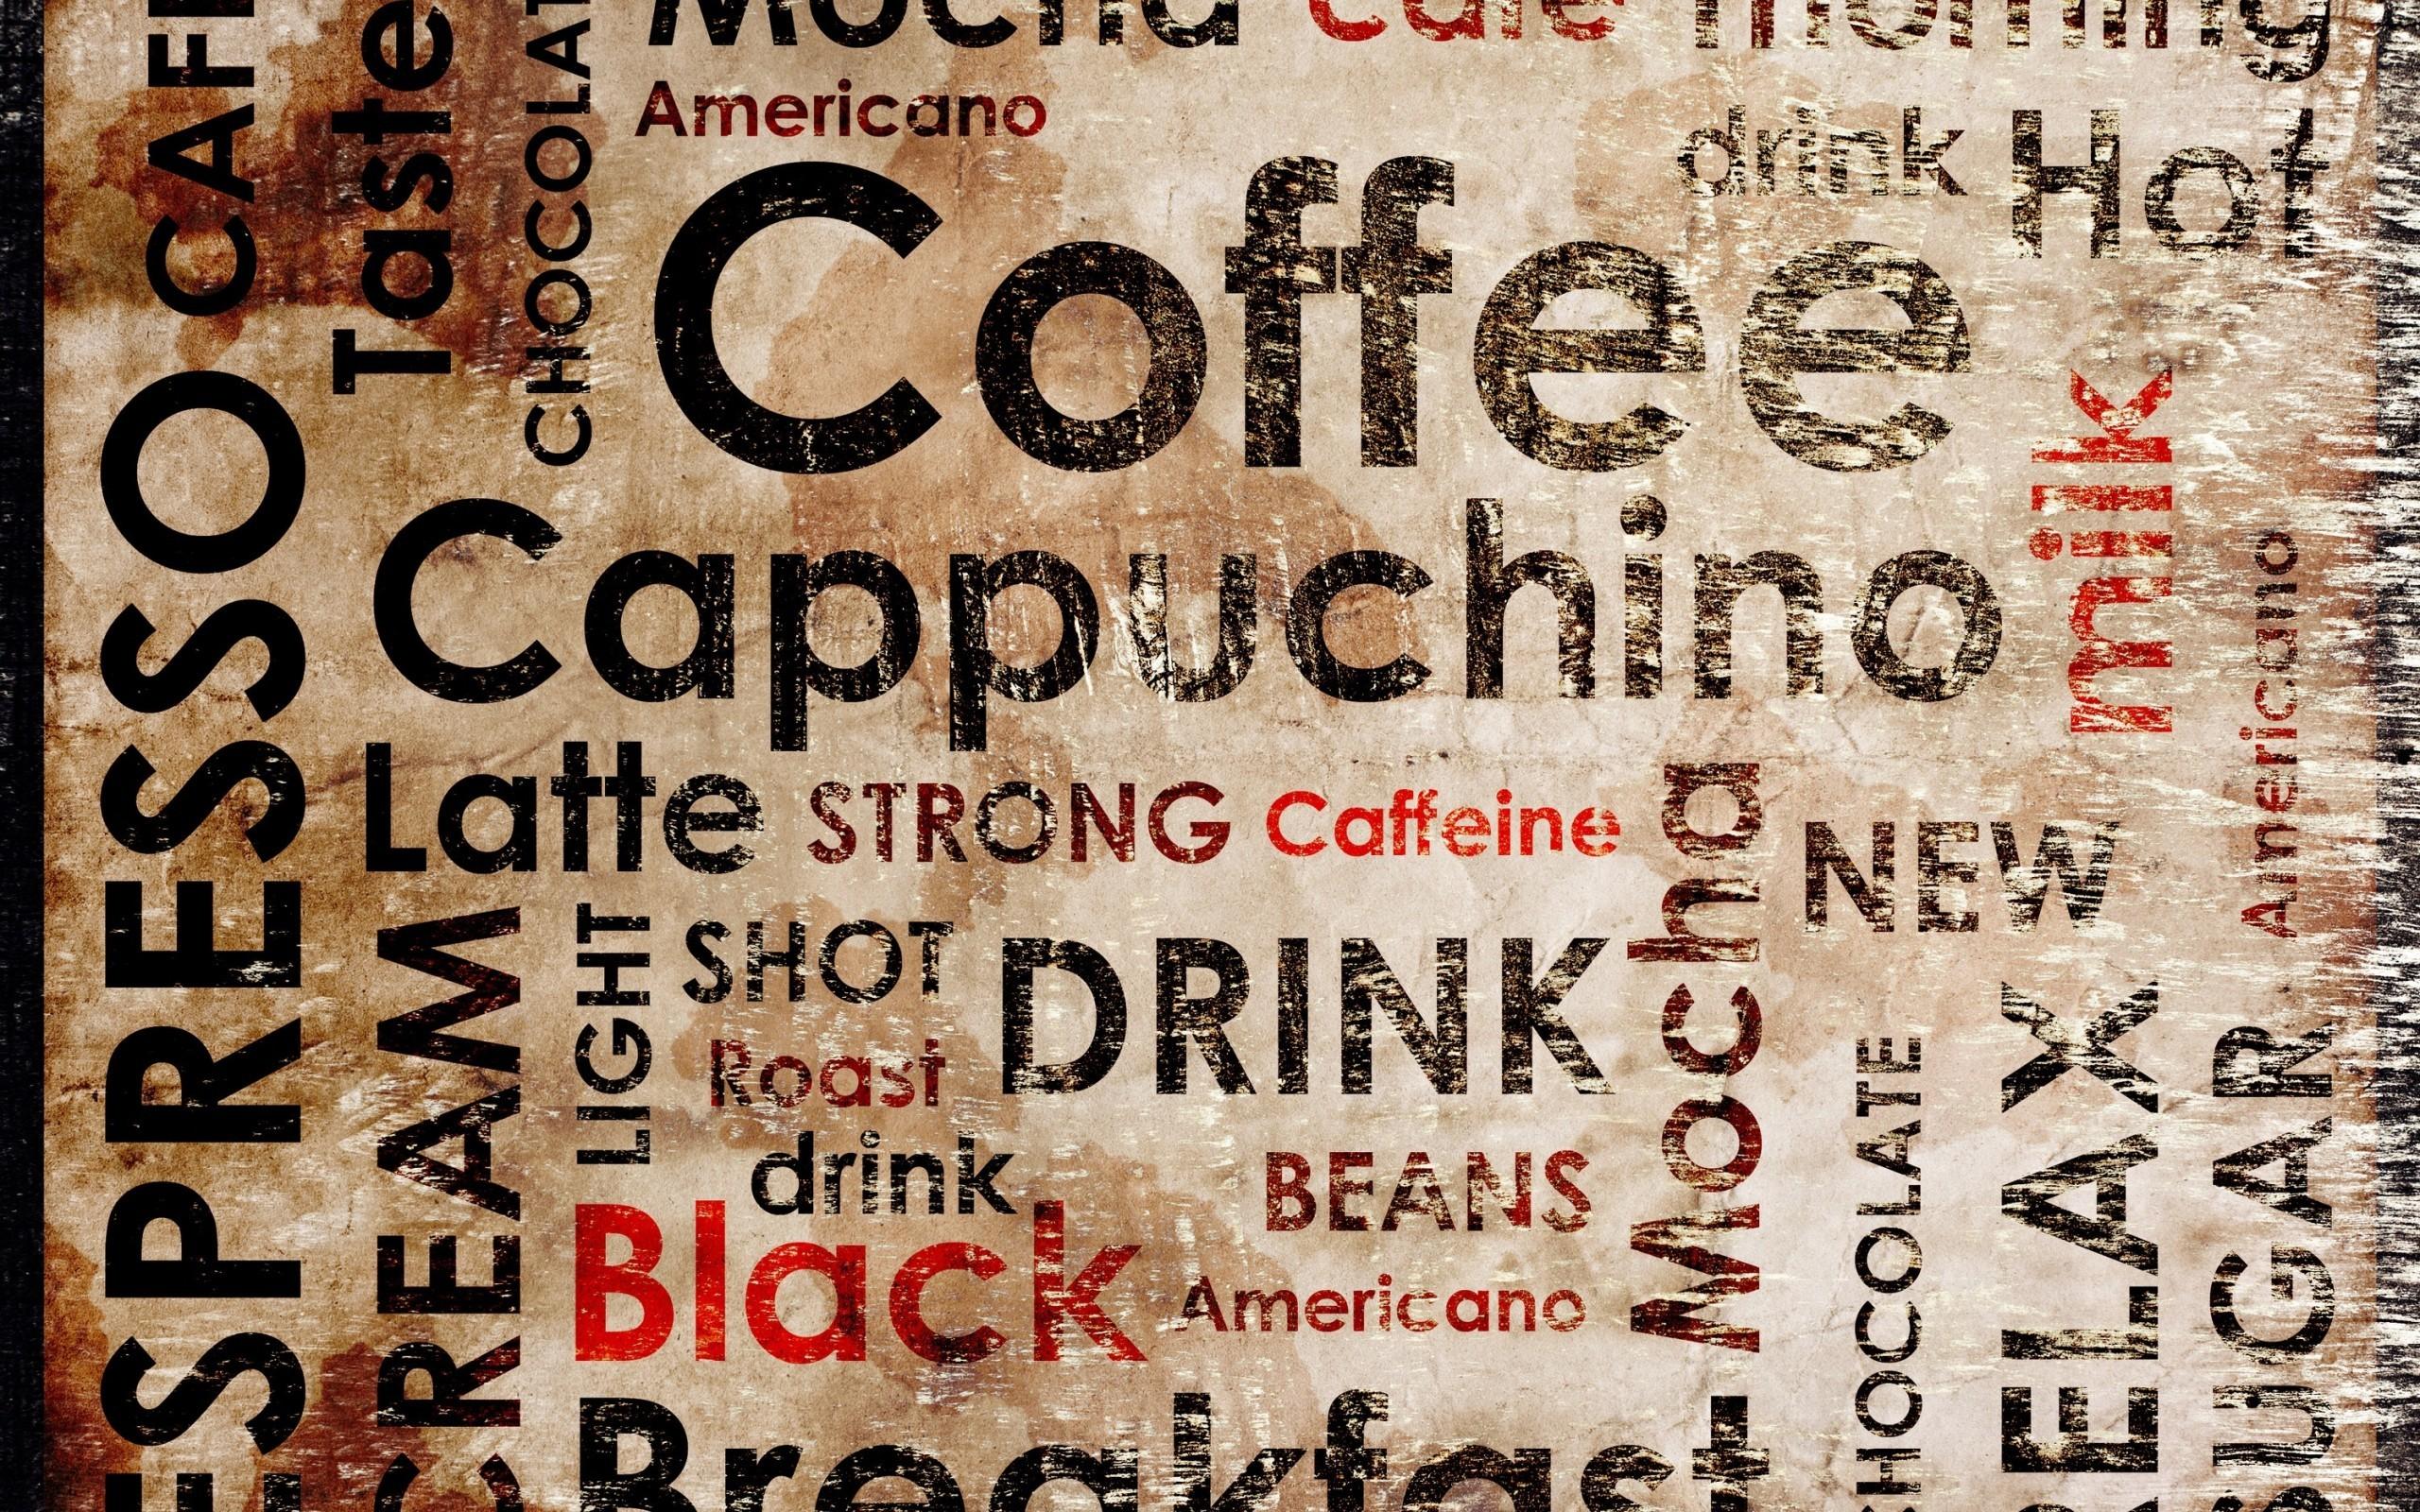 Cute Frappuccino Wallpaper Wallpaper 2560x1600 Px Coffee Typography 2560x1600